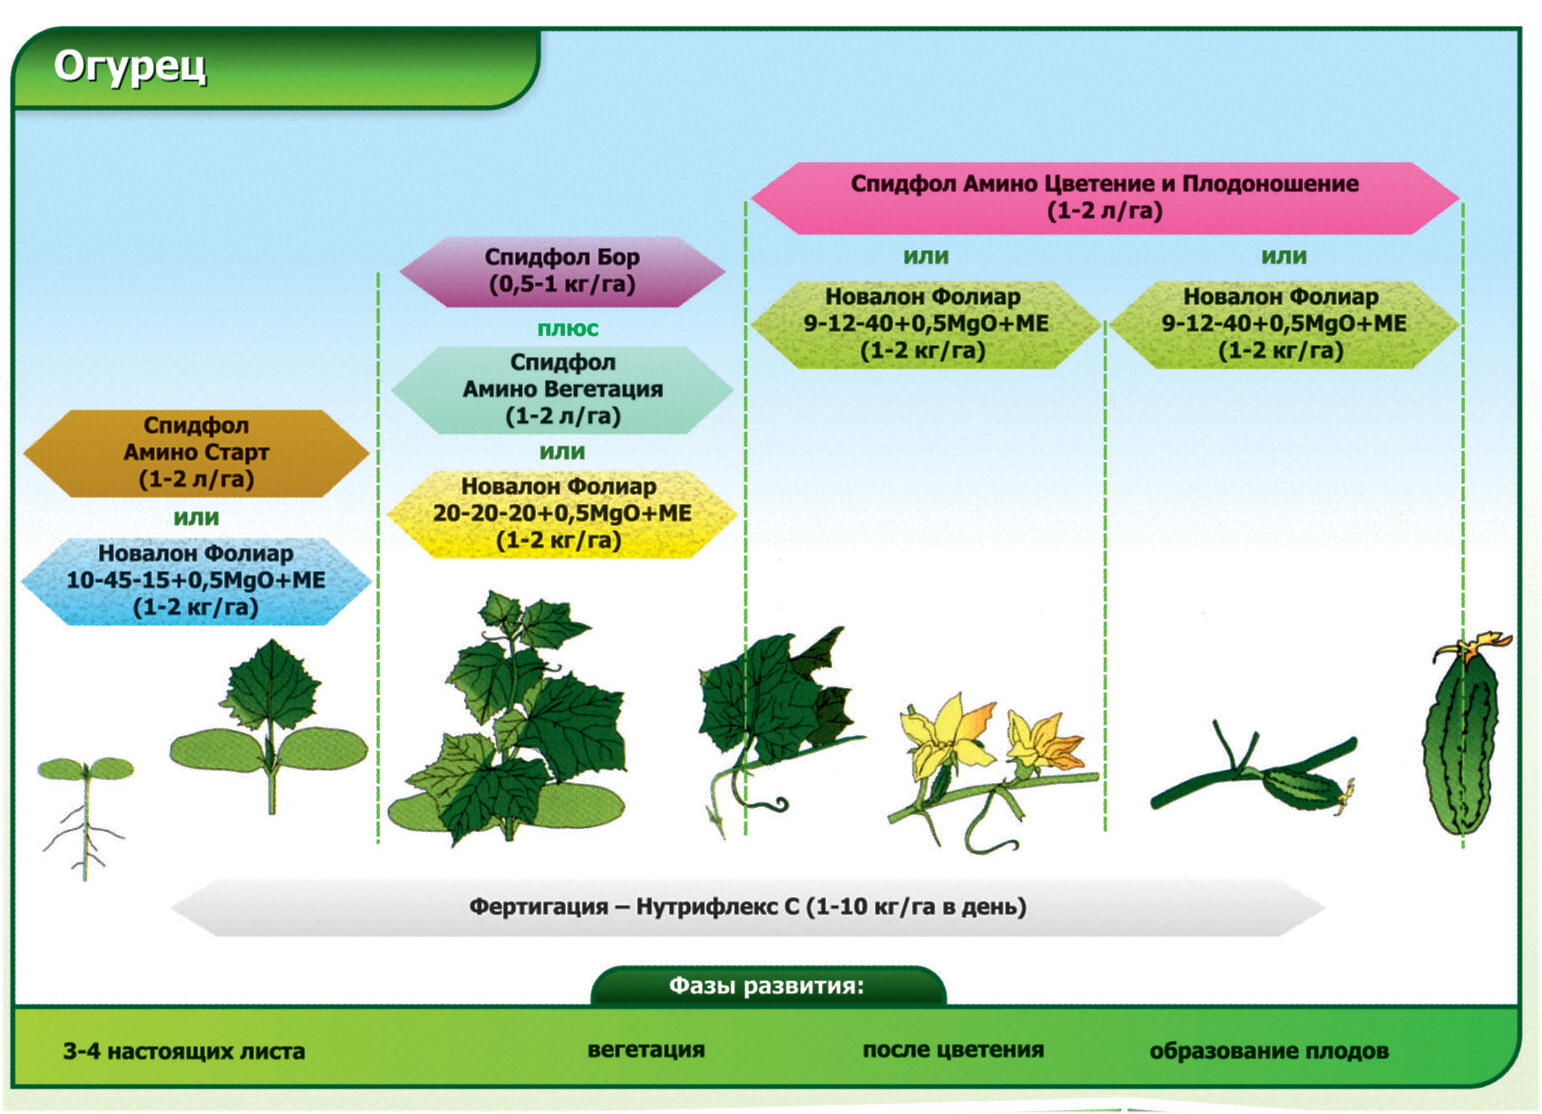 Схема фаз развития огурца